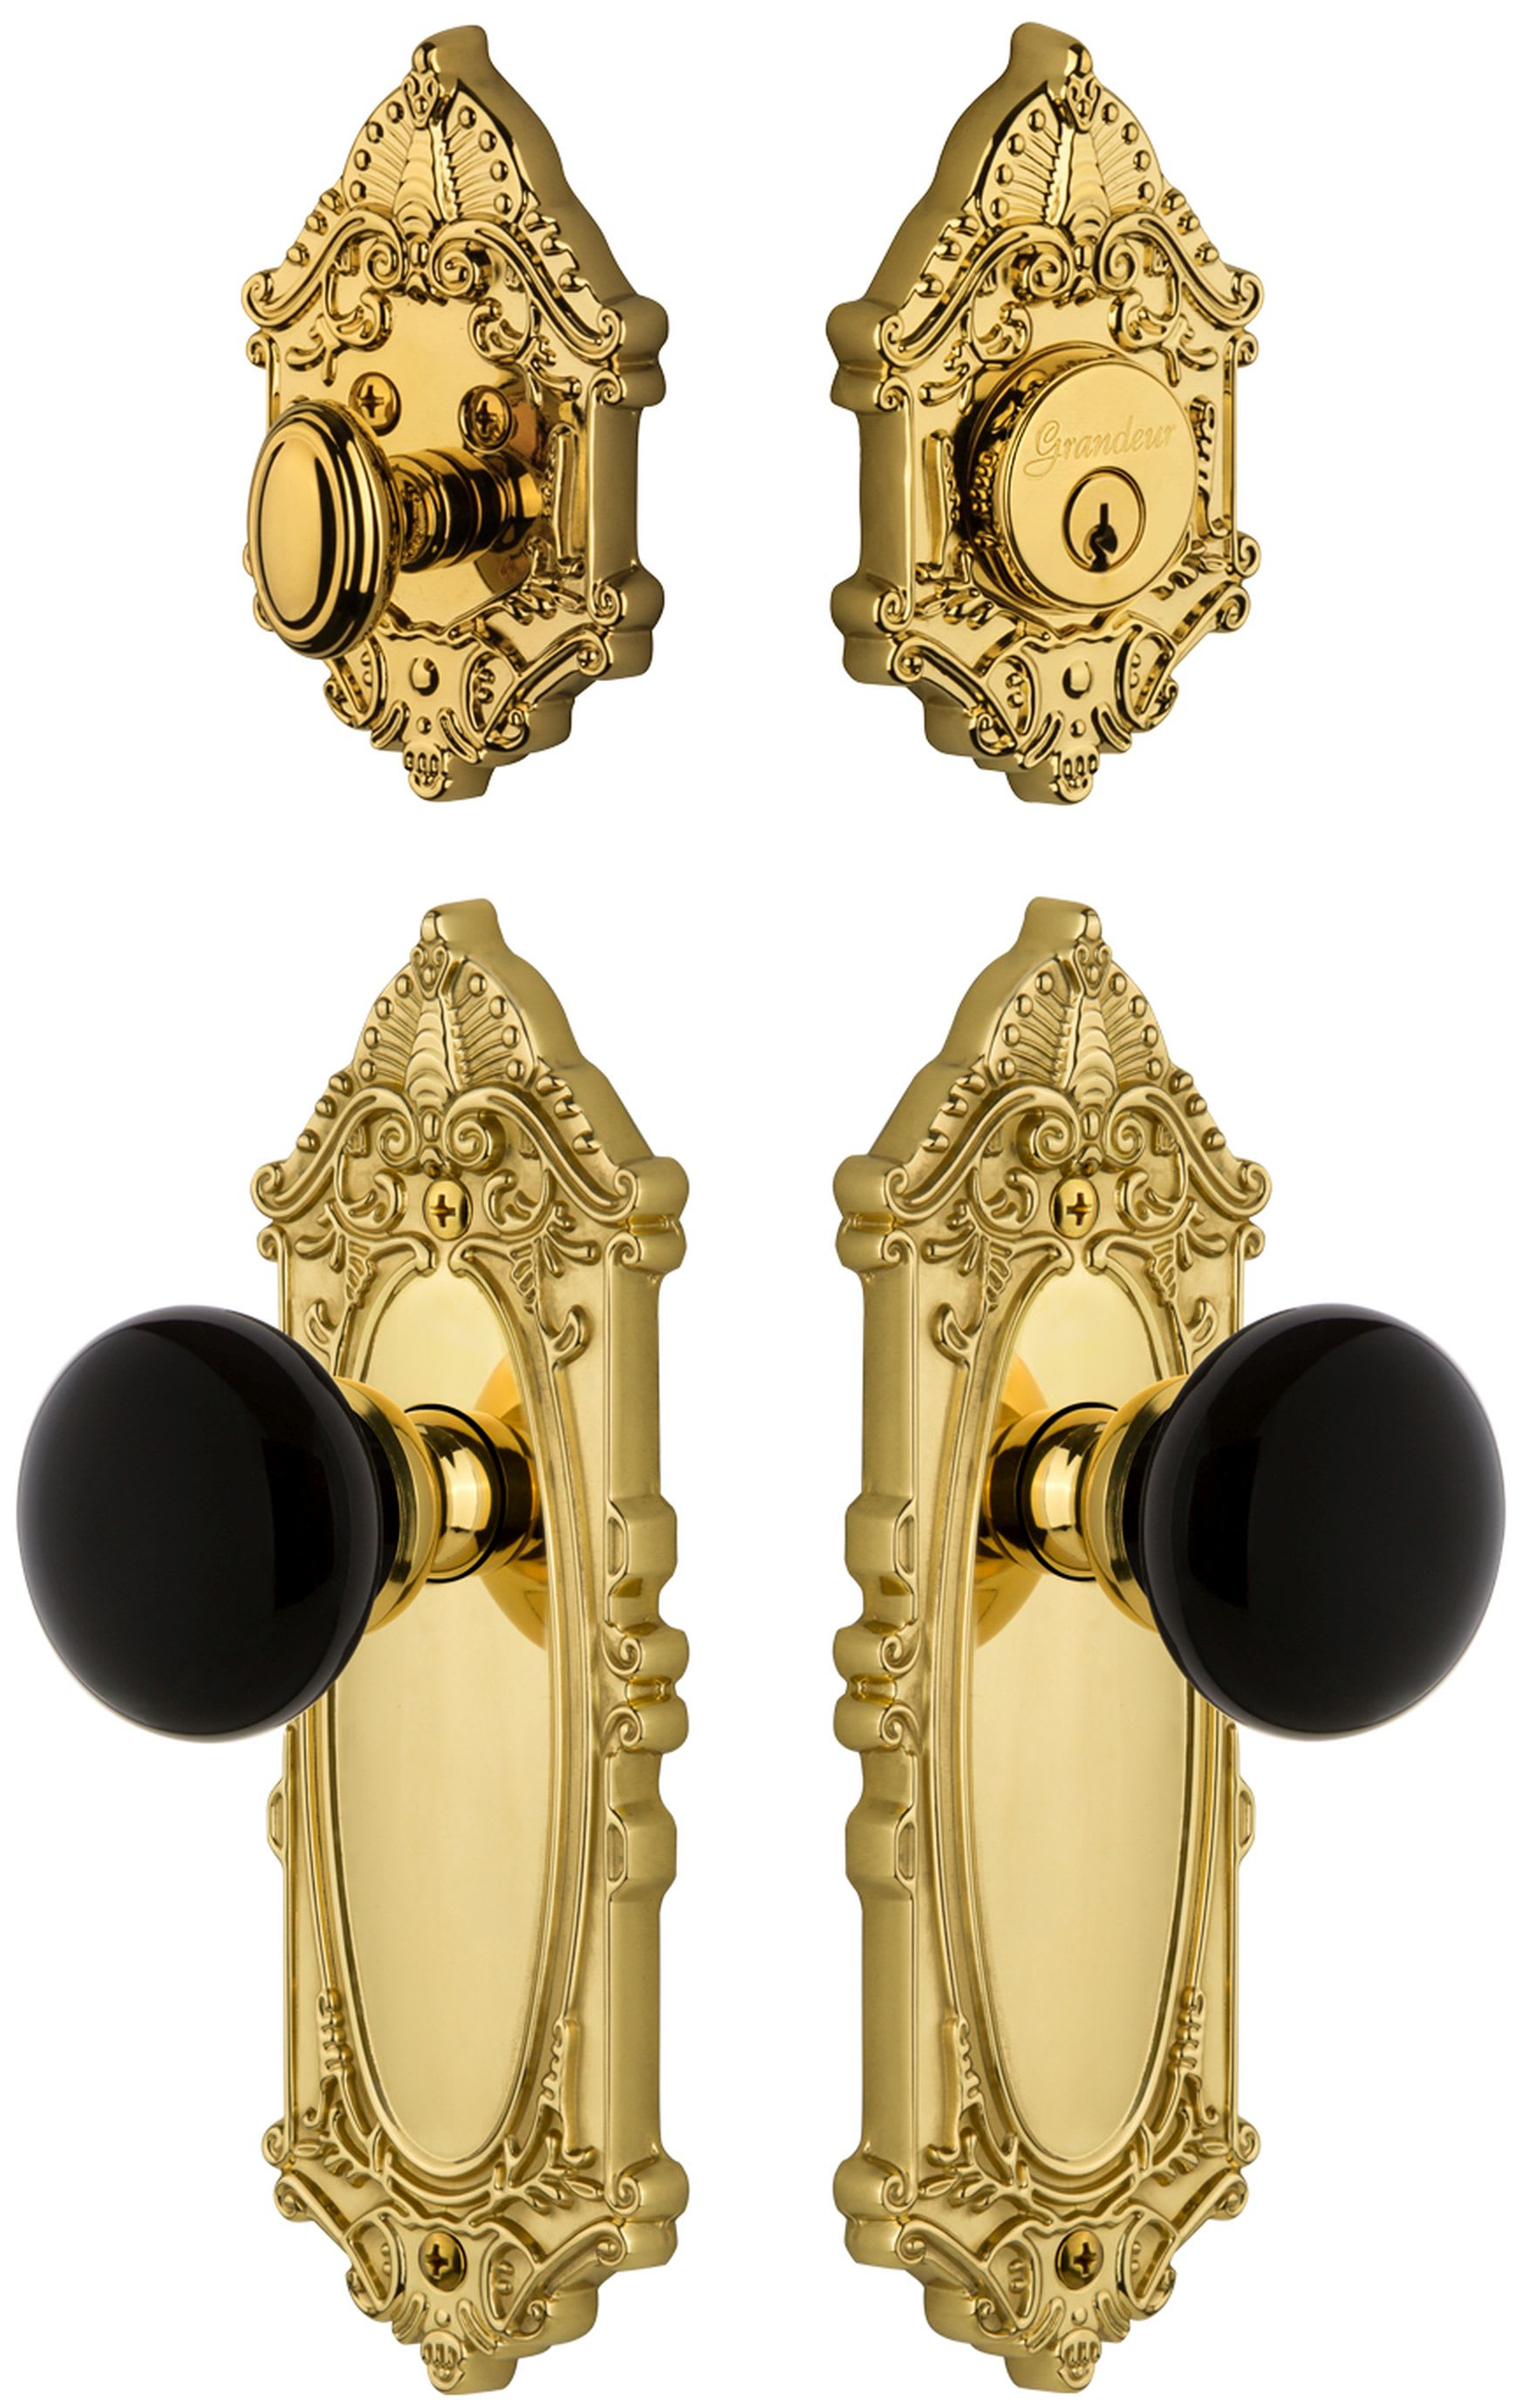 Grandeur 853420 Polished Nickel Grande Victorian Solid Brass Rose Single Cylinder Keyed Entry Deadbolt And Knobset Combo Pack With Coventry Knob And 2 3 8 Backset Handlesets Com